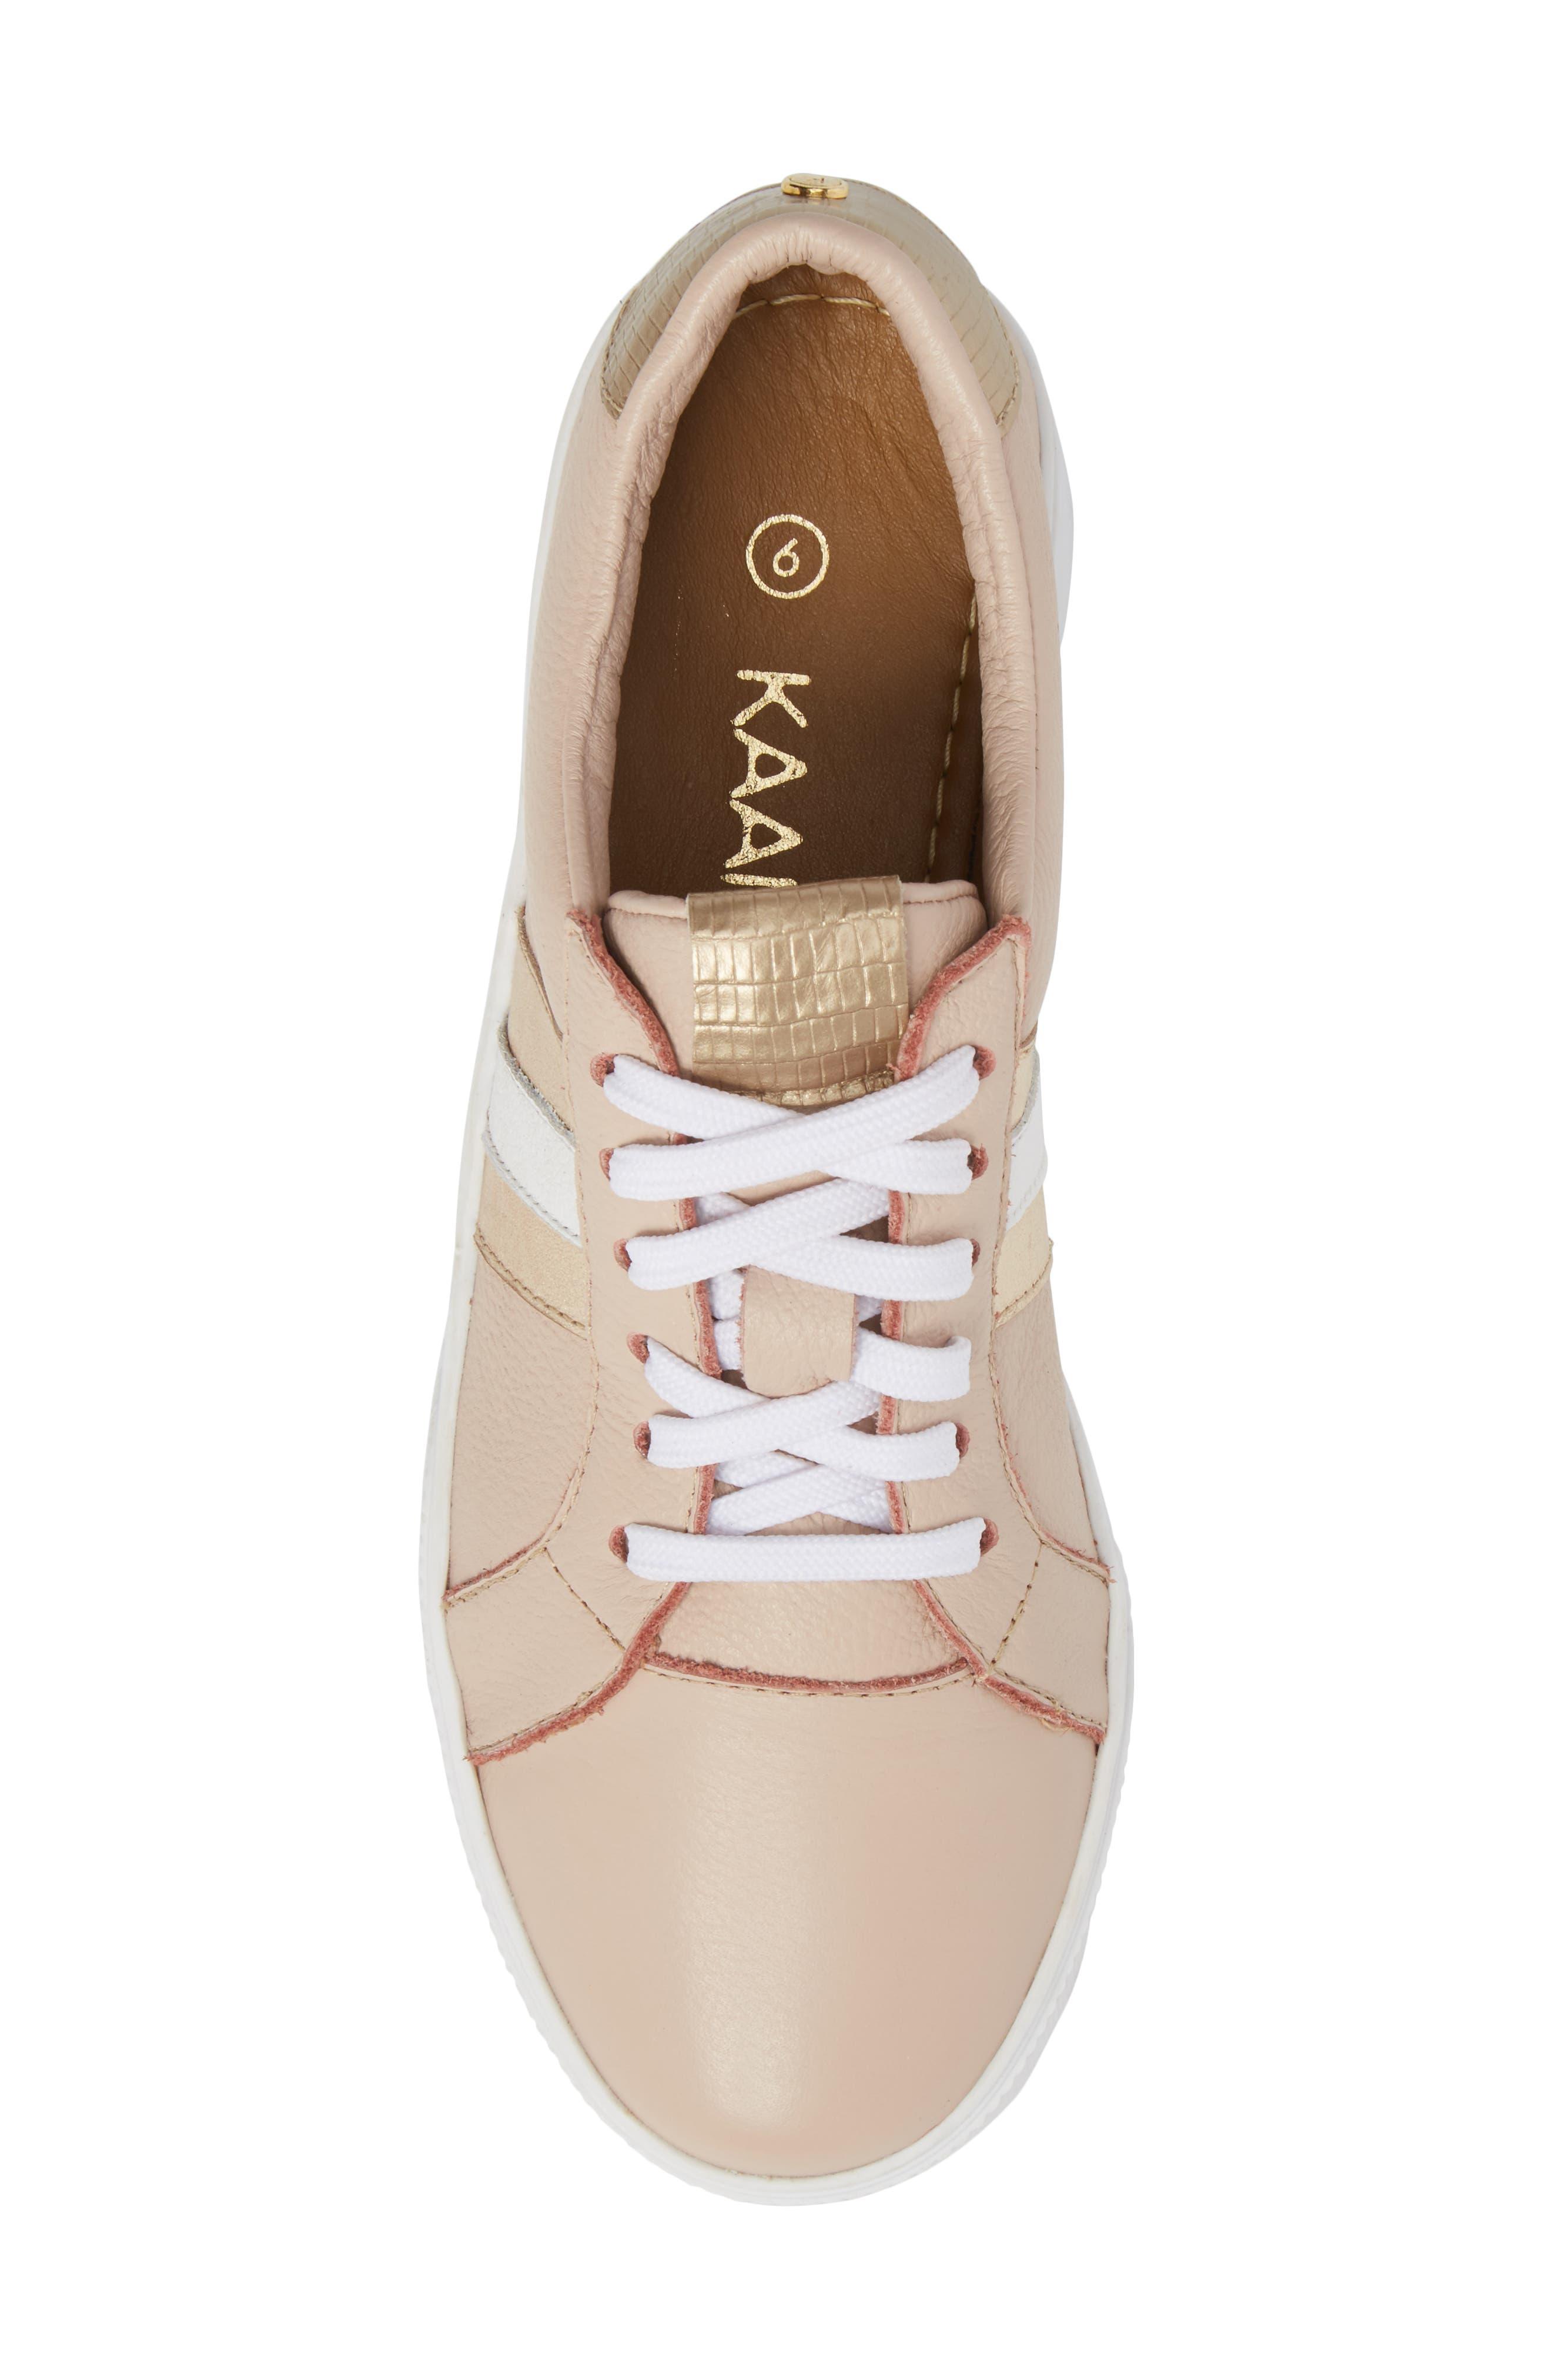 Tatacoa Low Top Sneaker,                             Alternate thumbnail 6, color,                             Blush